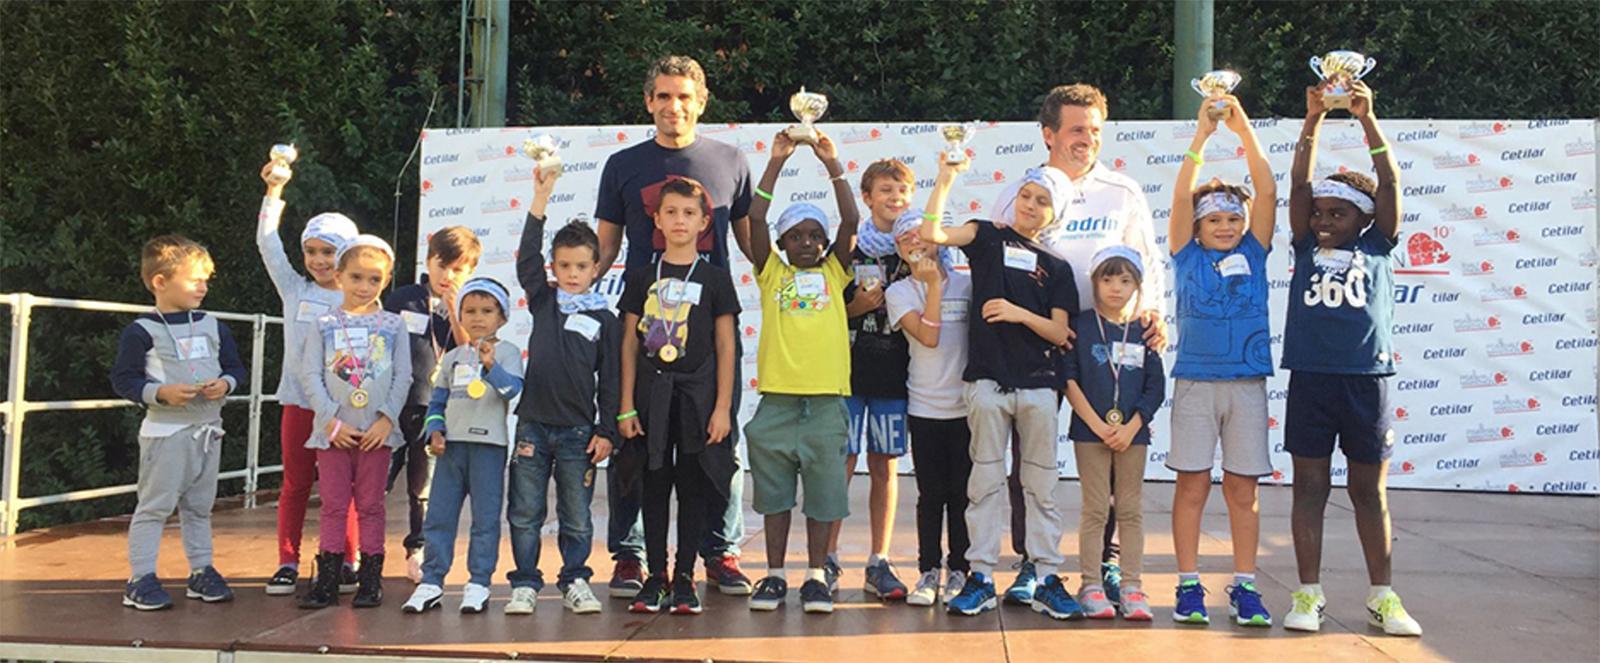 Junia Pharma at the Pisa Half Marathon: today's kids, tomorrow's champions